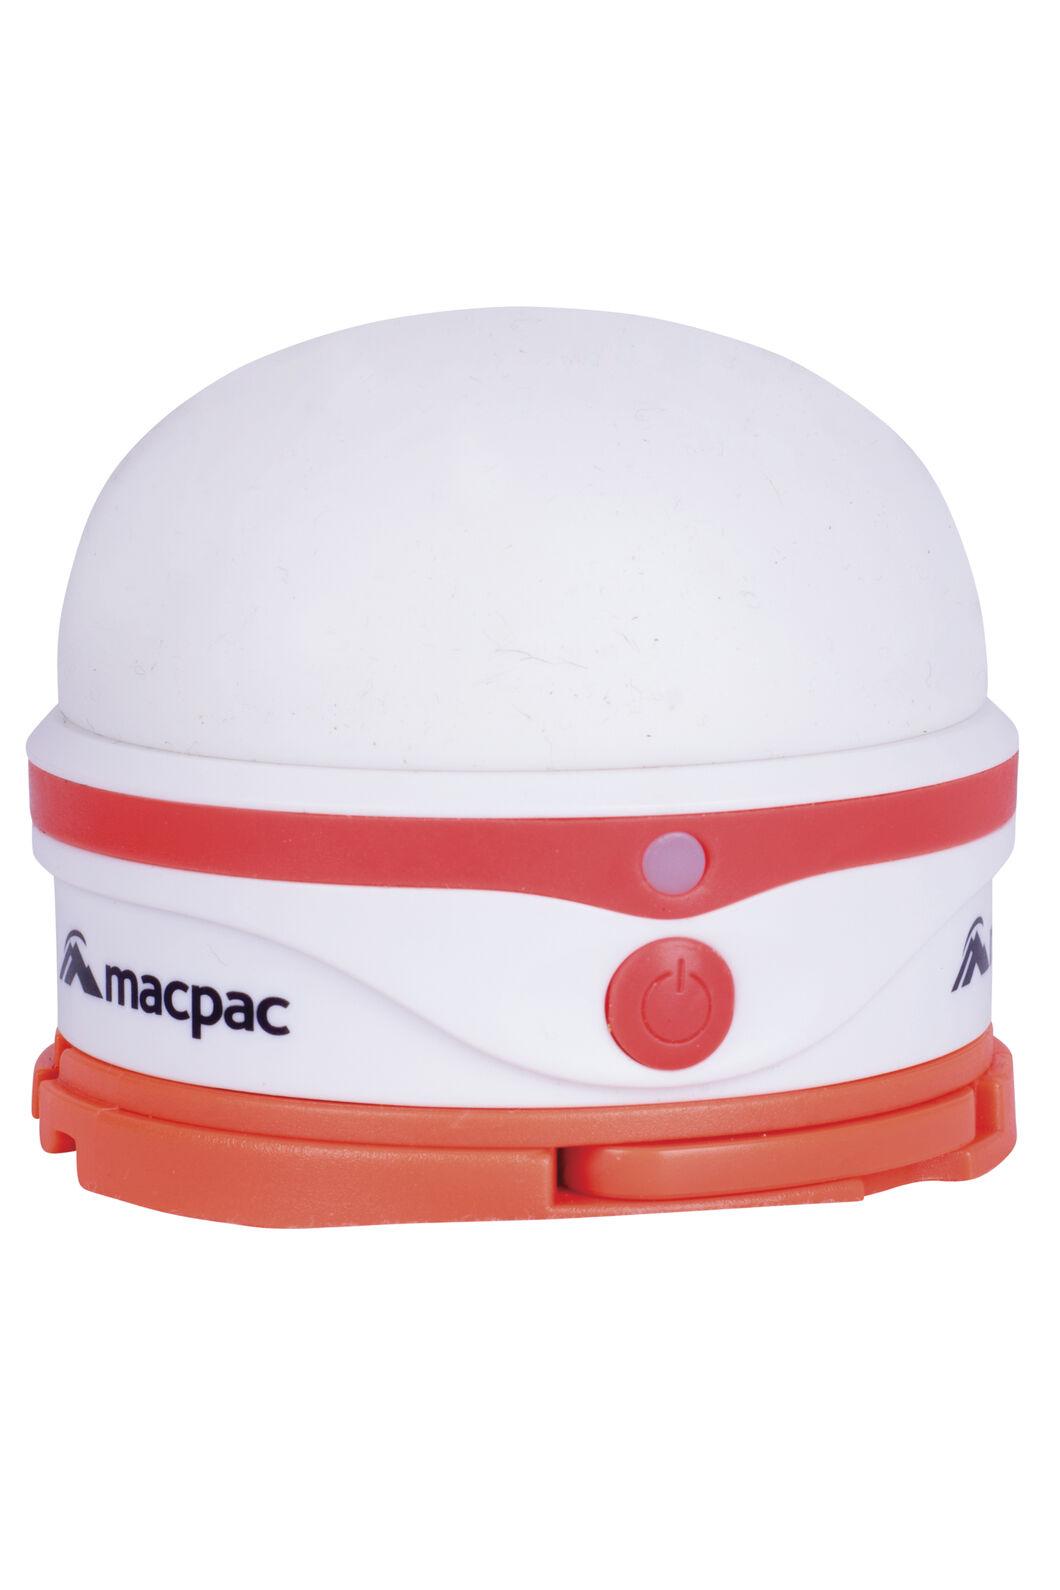 Macpac Mini Lantern, Orange, hi-res